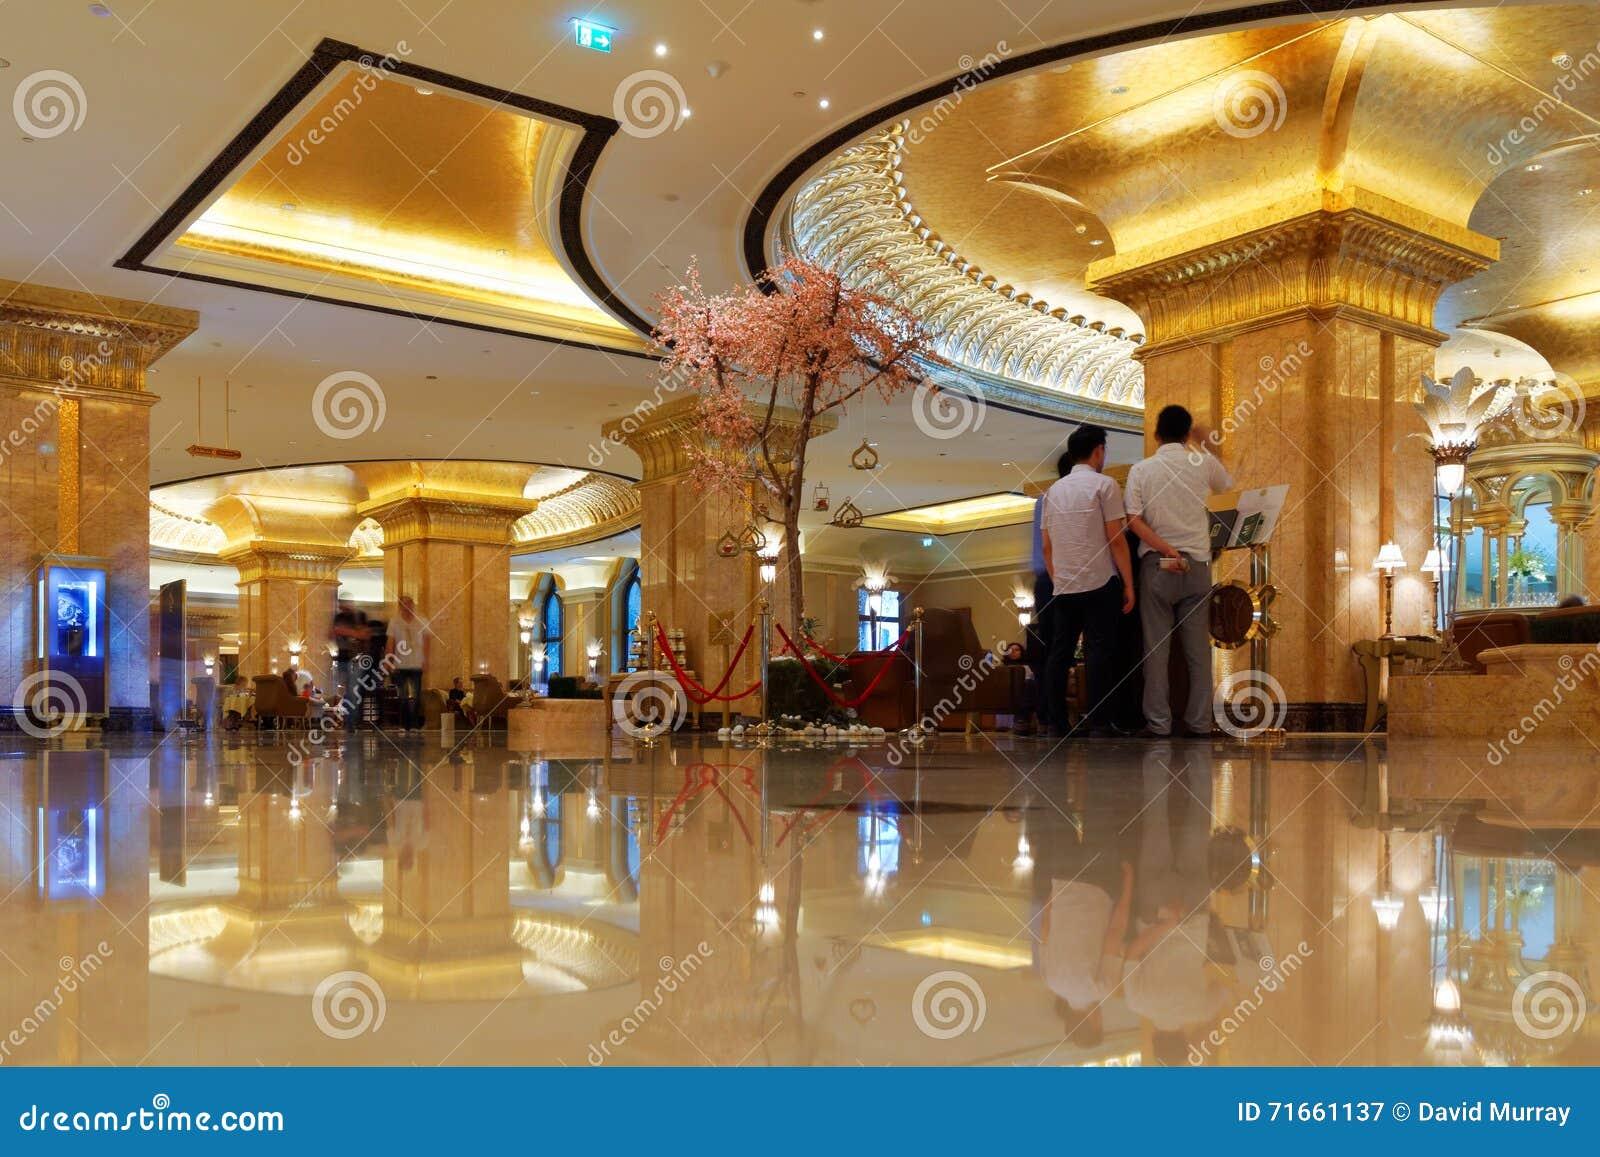 Businessmen in Lobby of Emirates Palace Hotel, Abu Dhabi